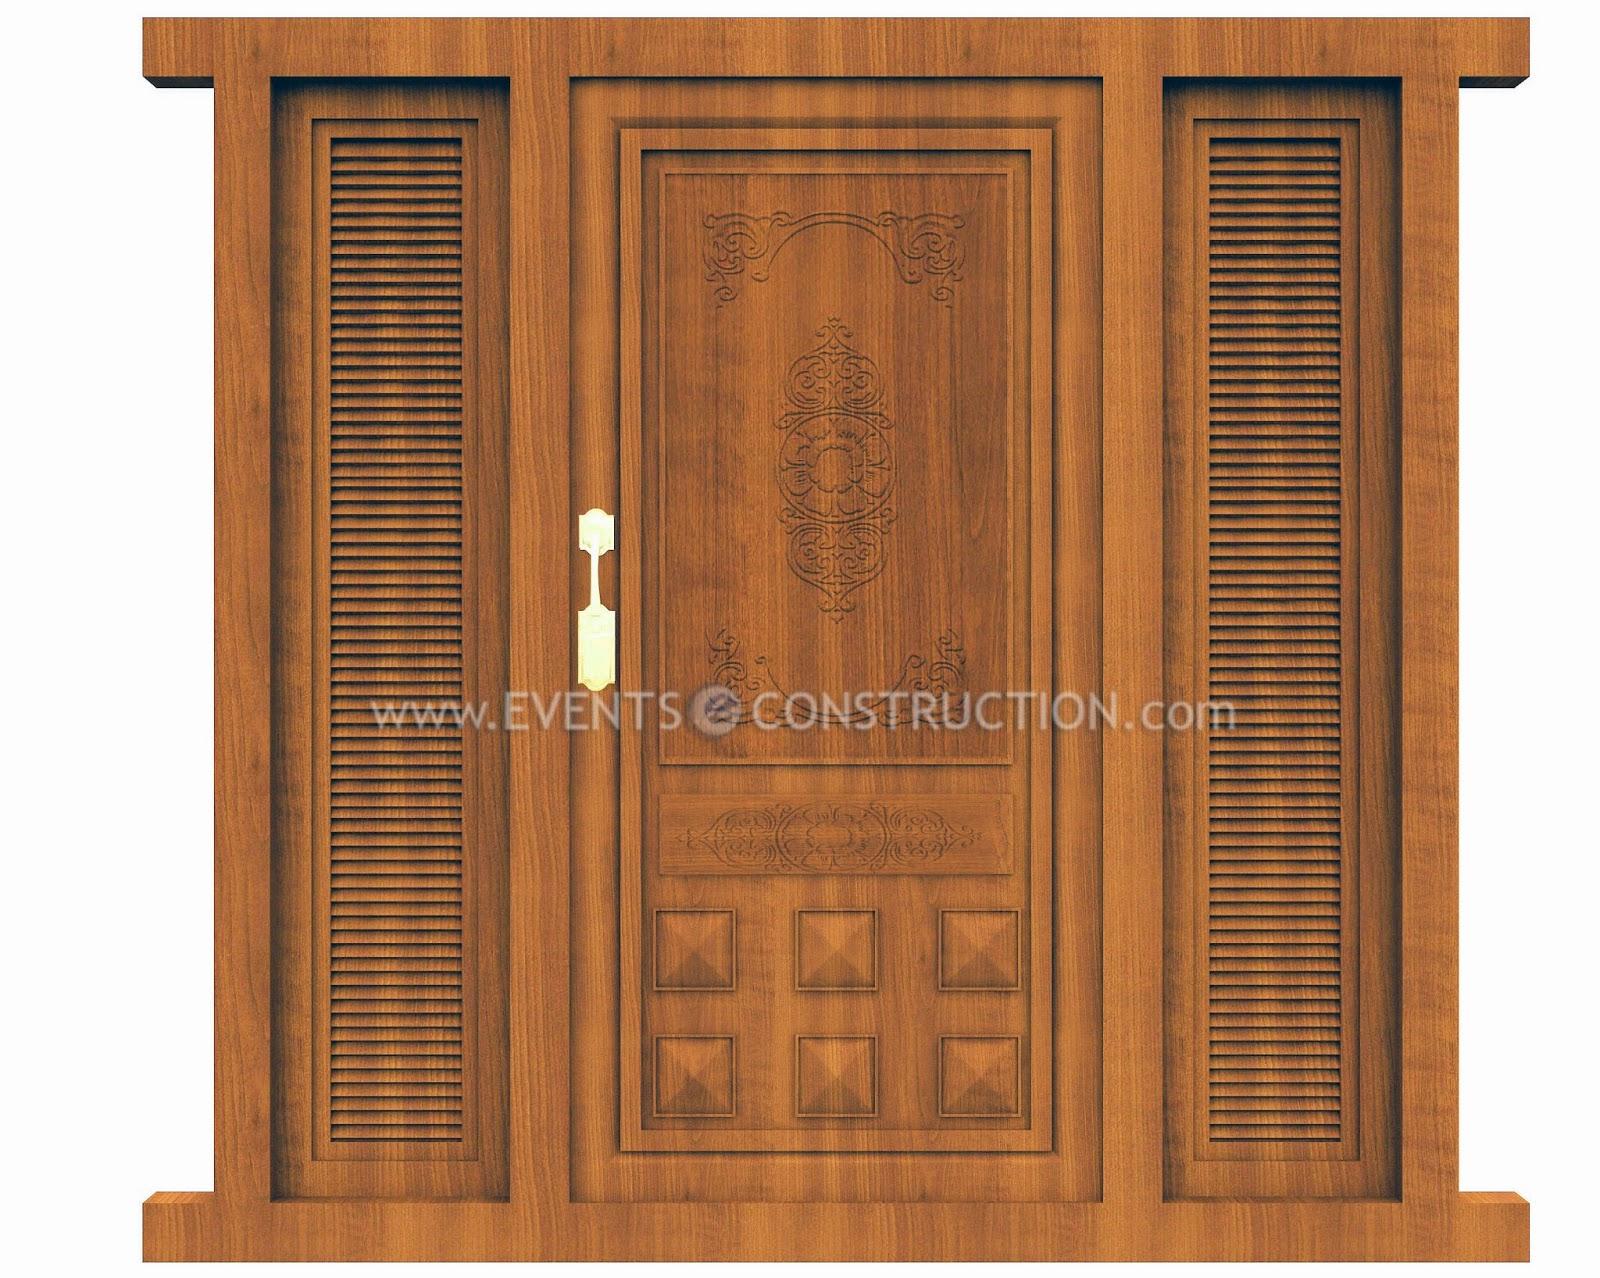 Evens Construction Pvt Ltd: Wooden main door design